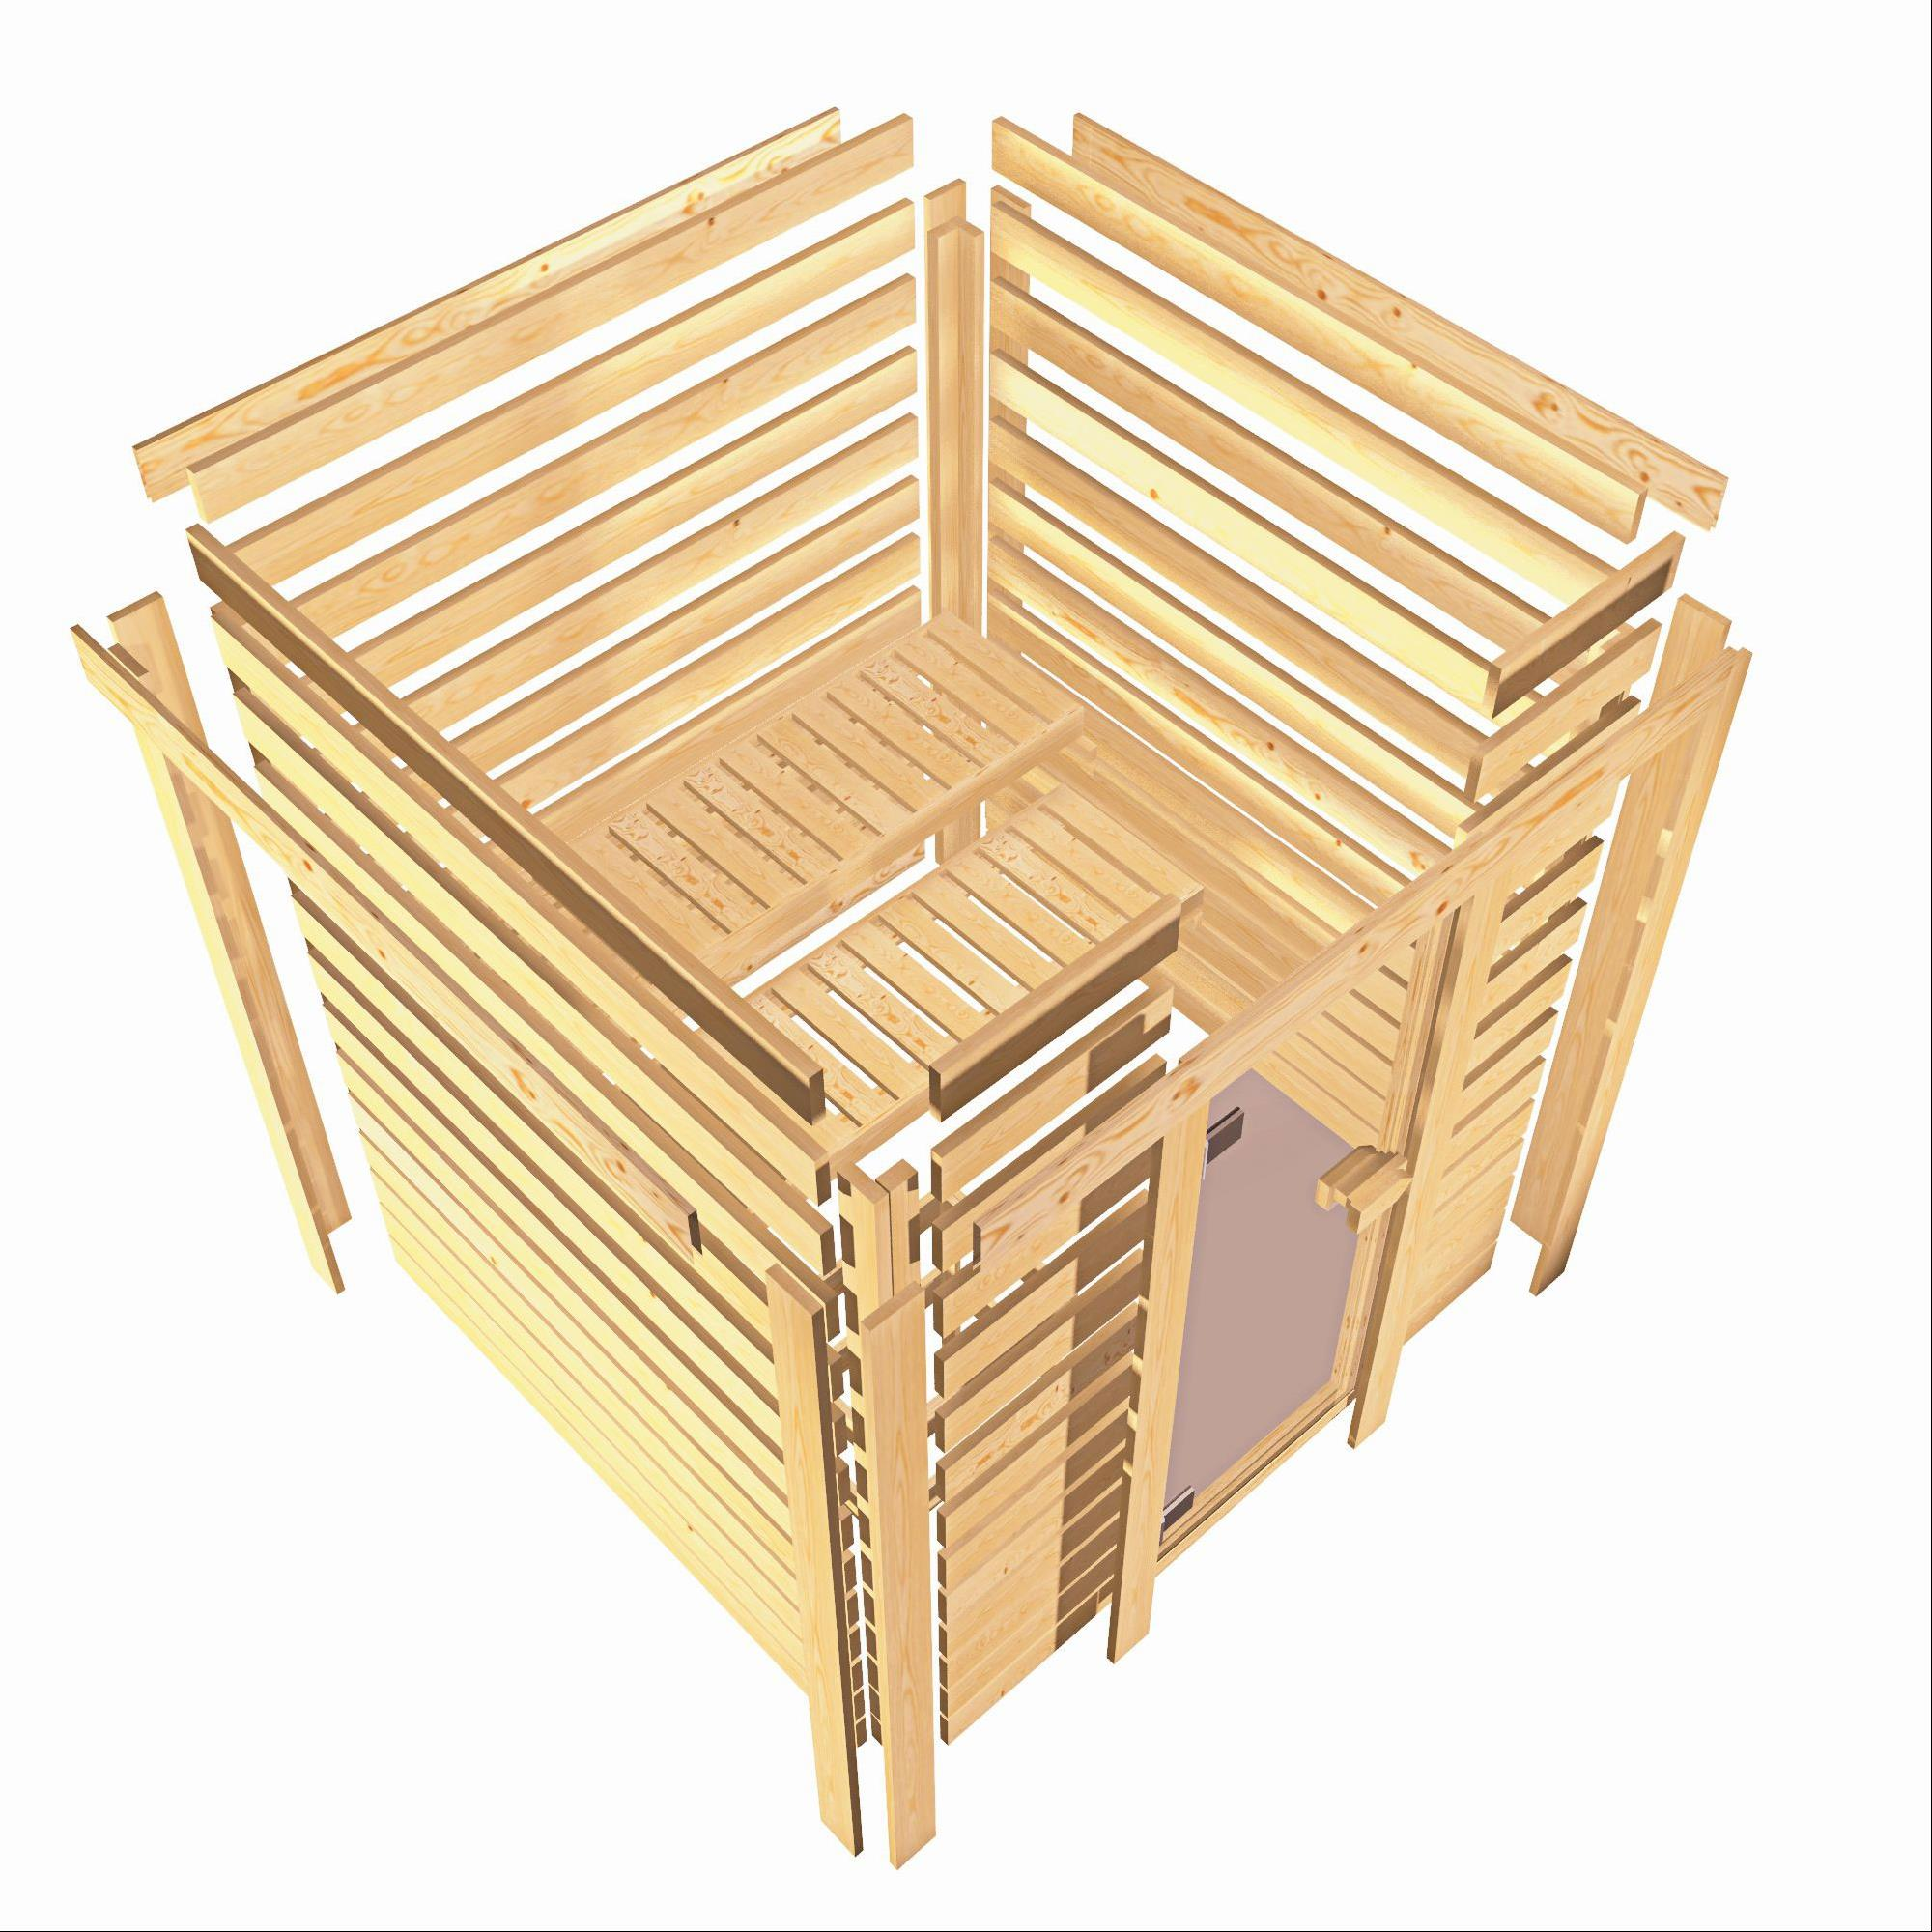 Woodfeeling Sauna Leona 38mm Kranz Ofen 9kW extern Tür Modern Bild 4